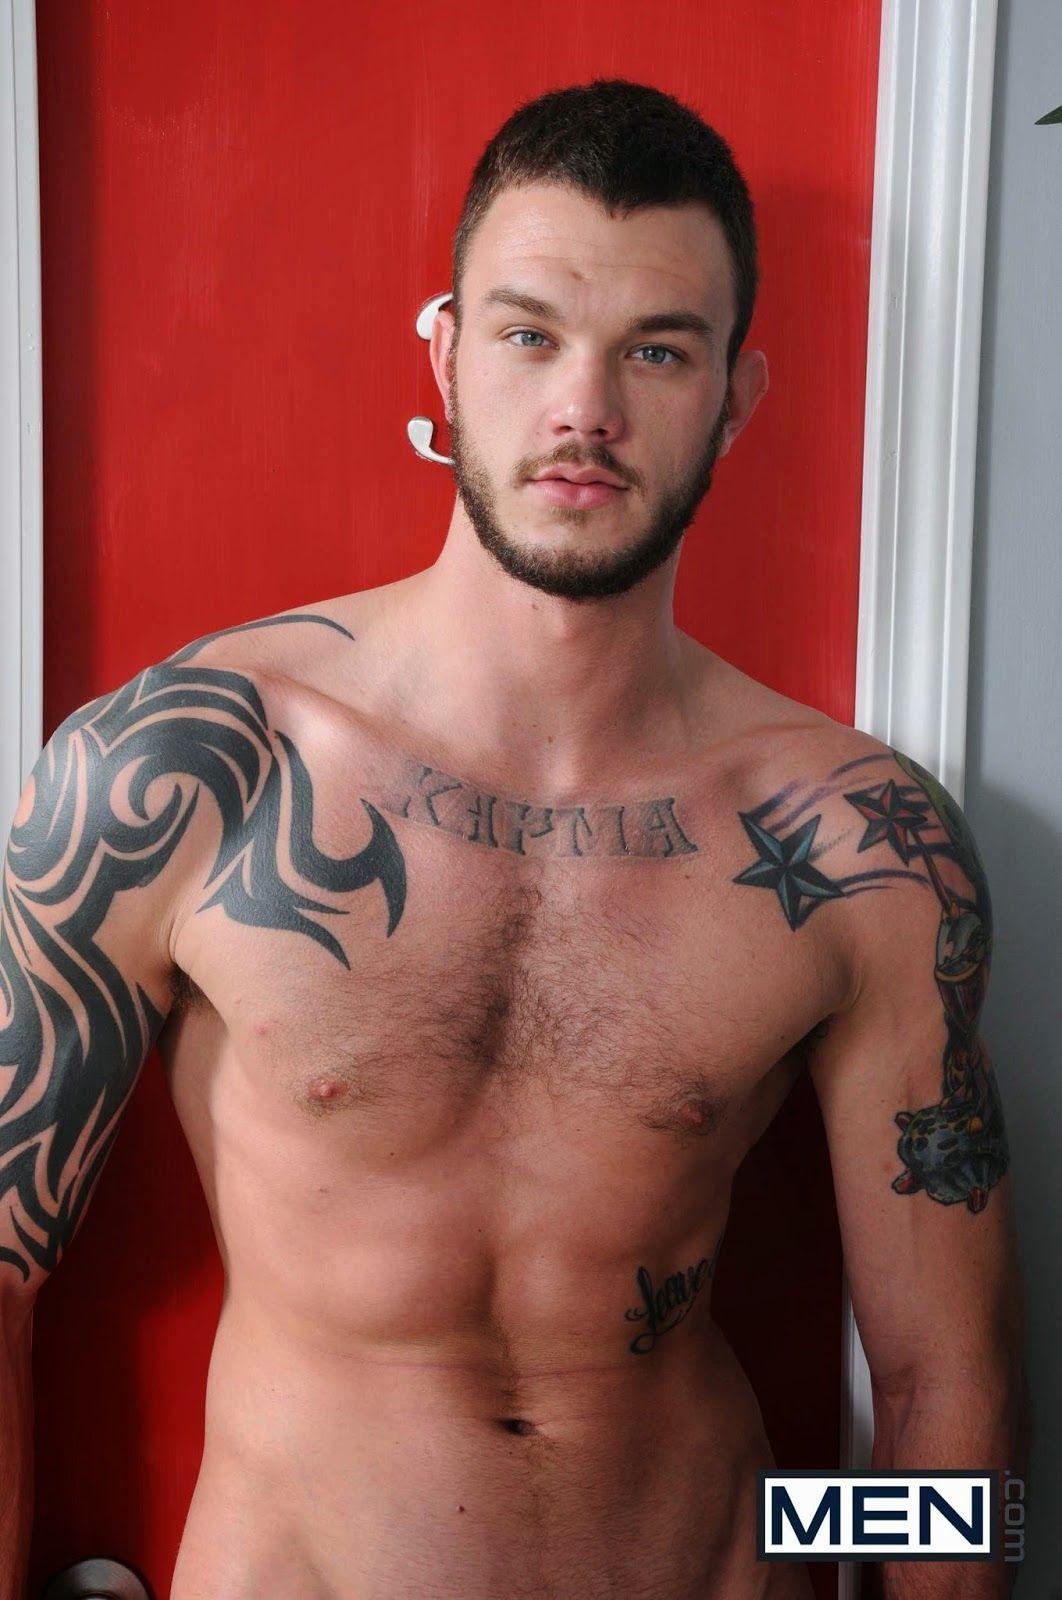 Venture Bros Gay Porn Awesome junior nascimento (0qn41hs5vc3wwln) on pinterest